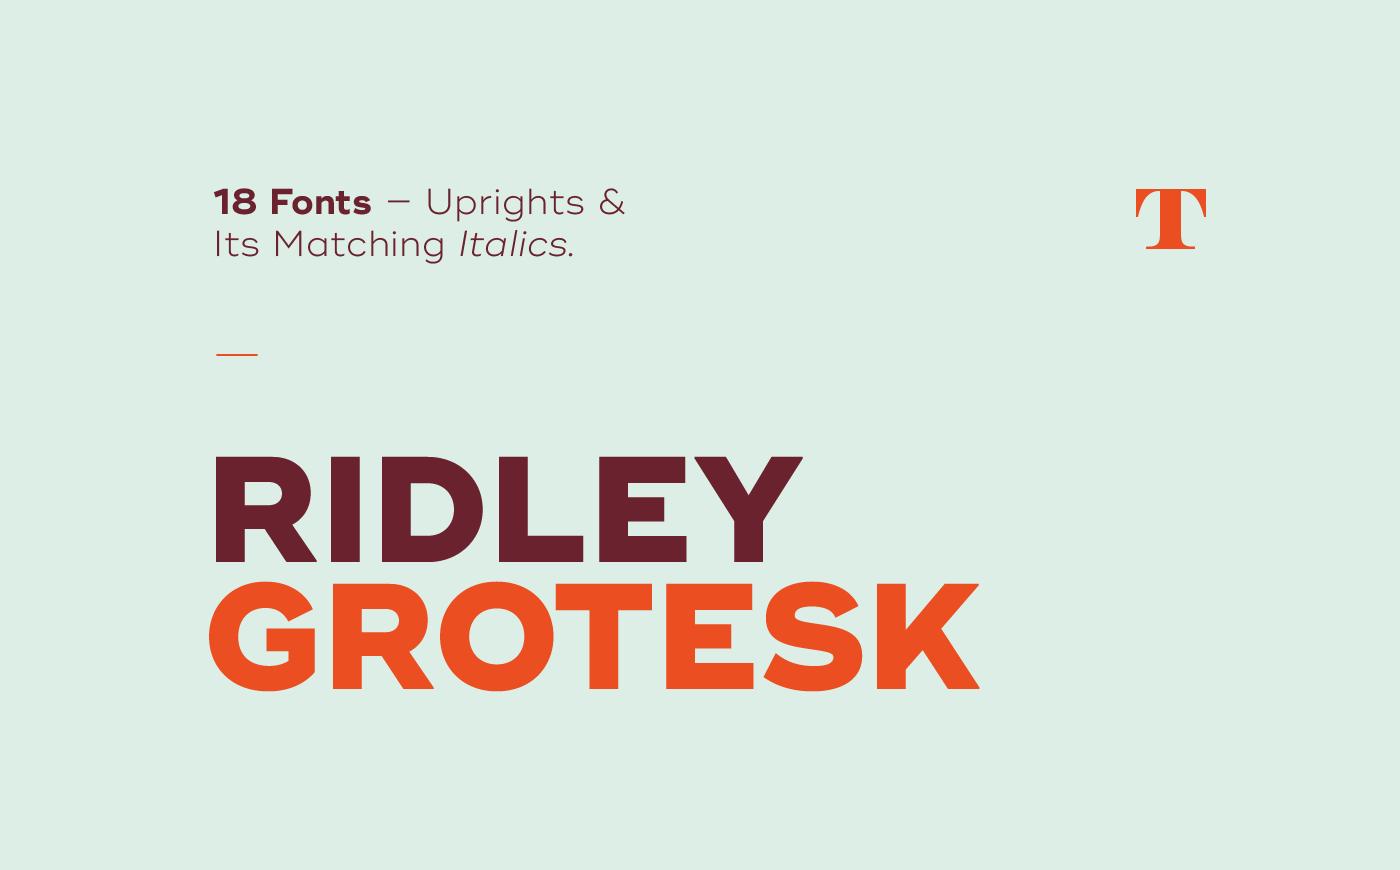 Ridley Grotesk Free Font / Tinkov